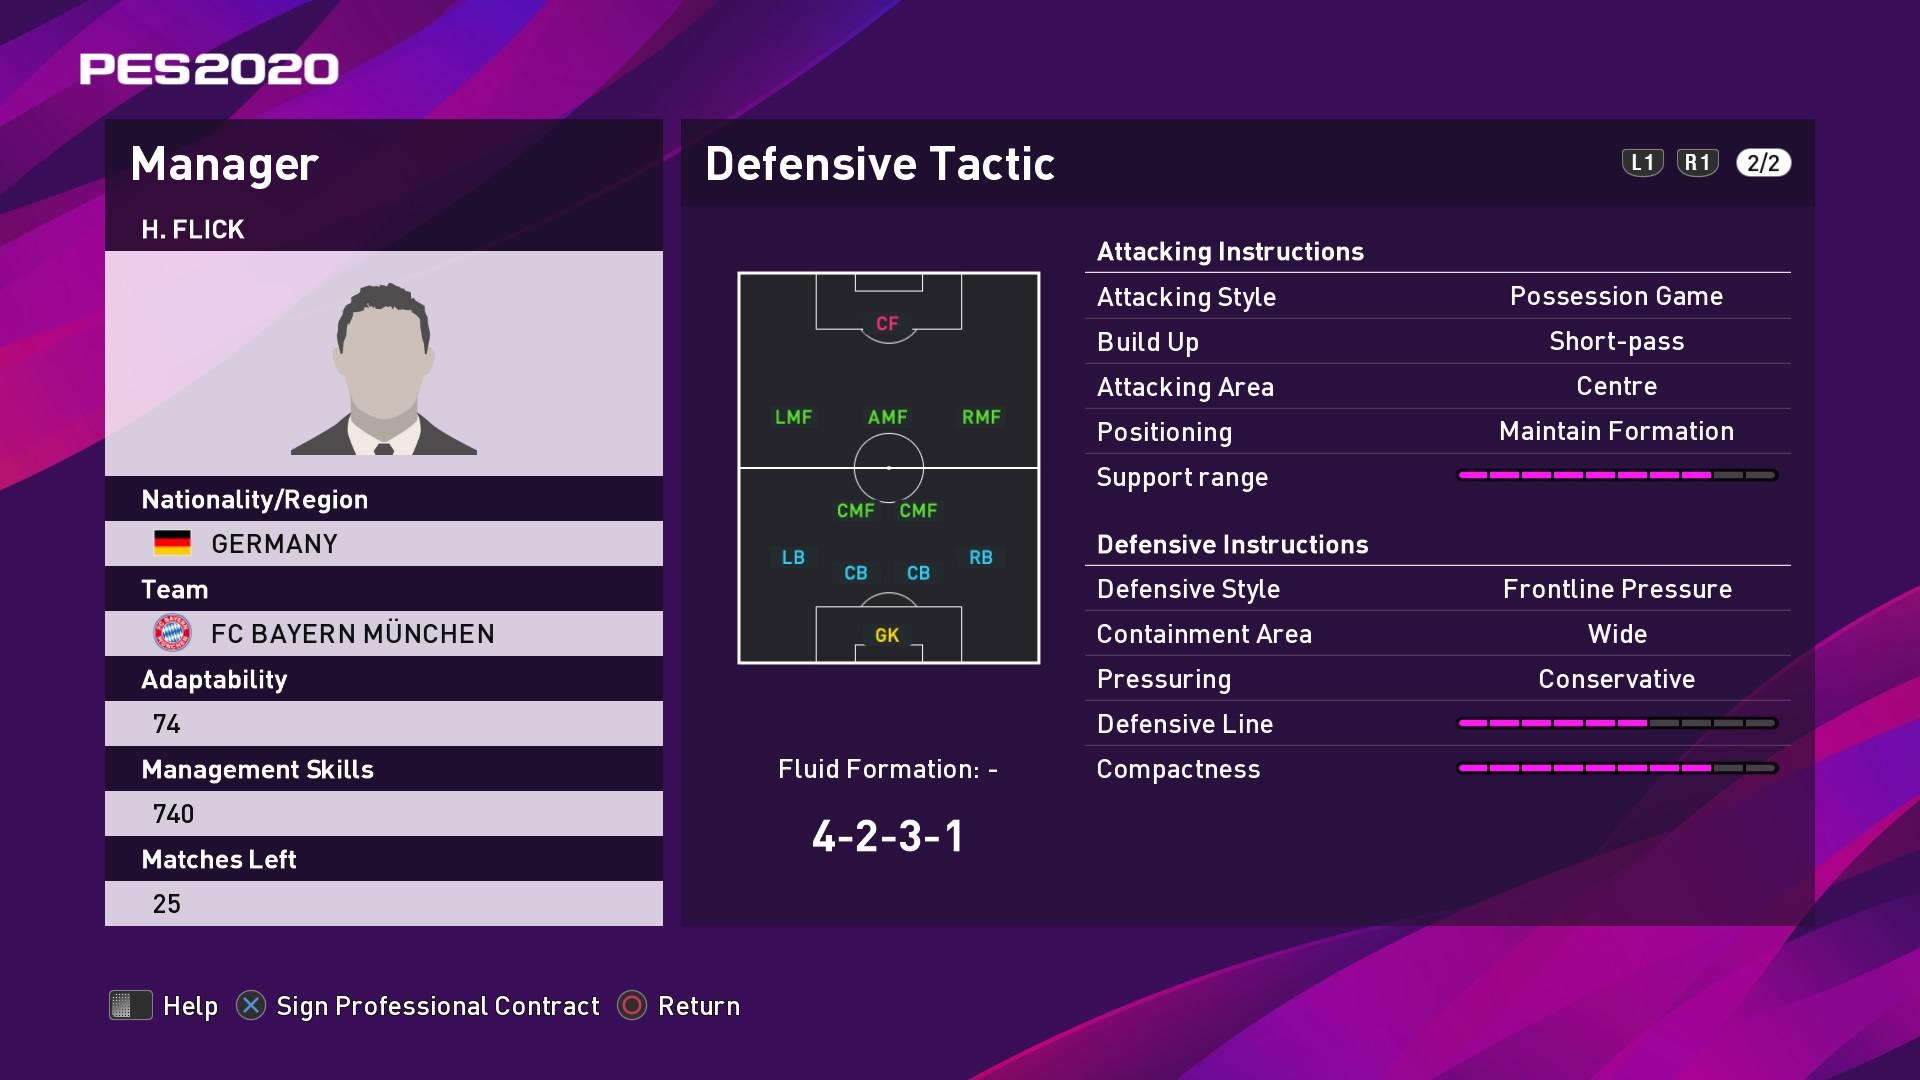 H. Flick (Hans-Dieter Flick) Defensive Tactic in PES 2020 myClub